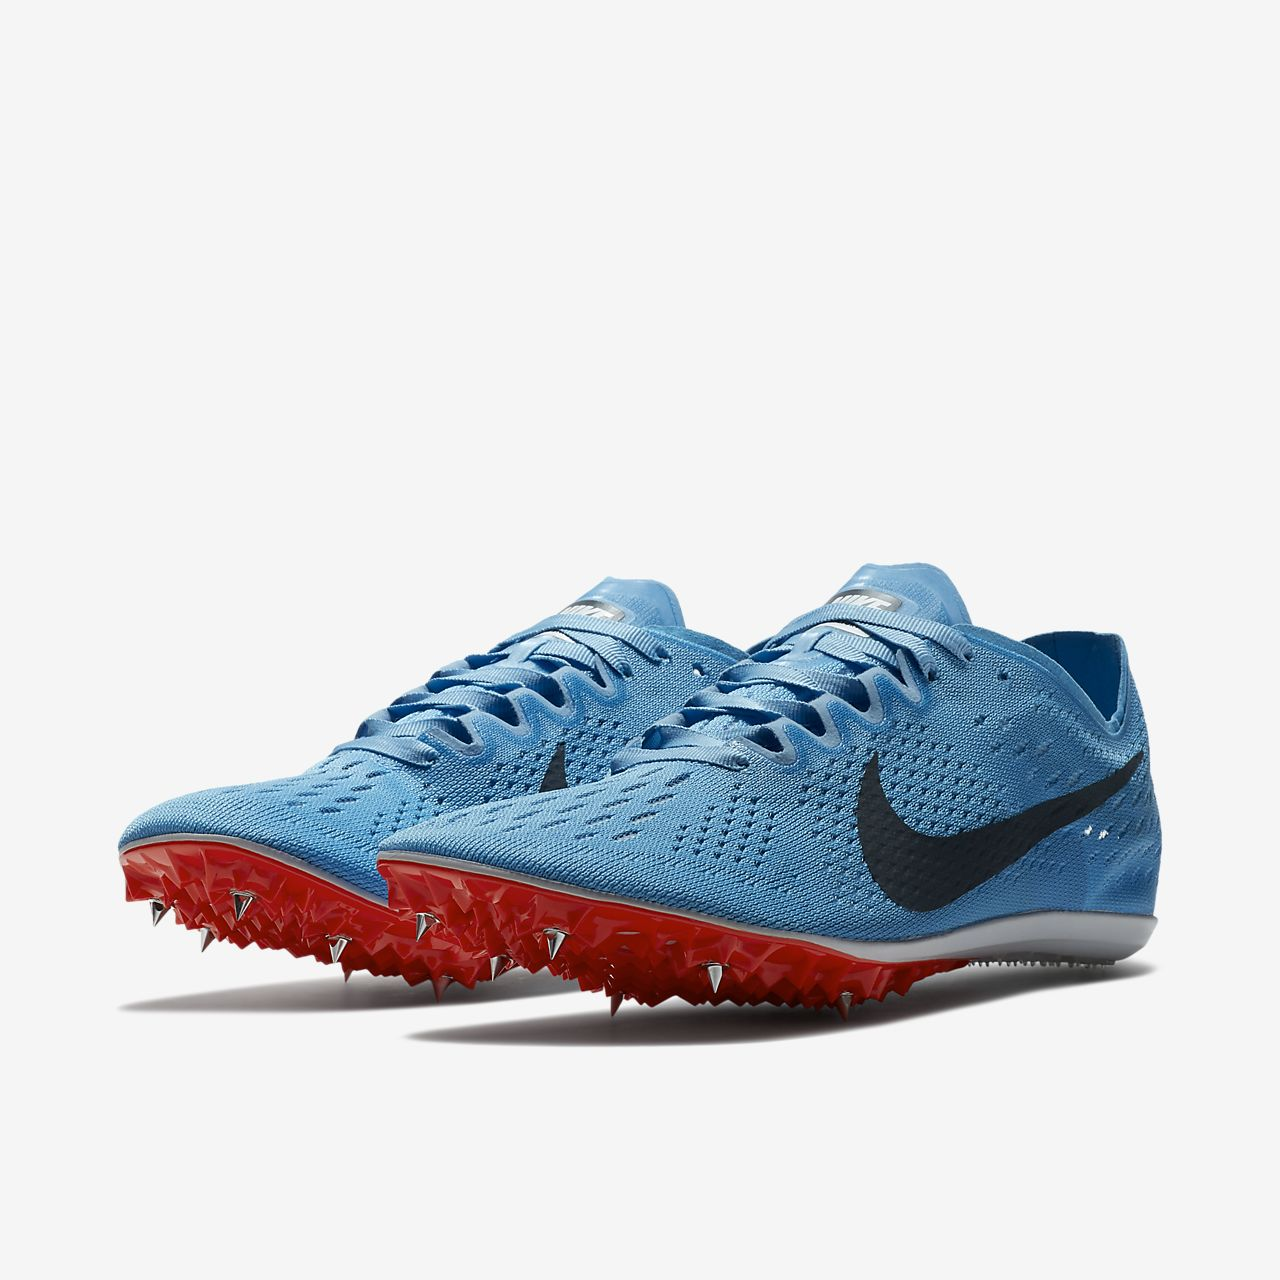 ... Scarpa chiodata da gara Nike Zoom Victory 3 - Unisex